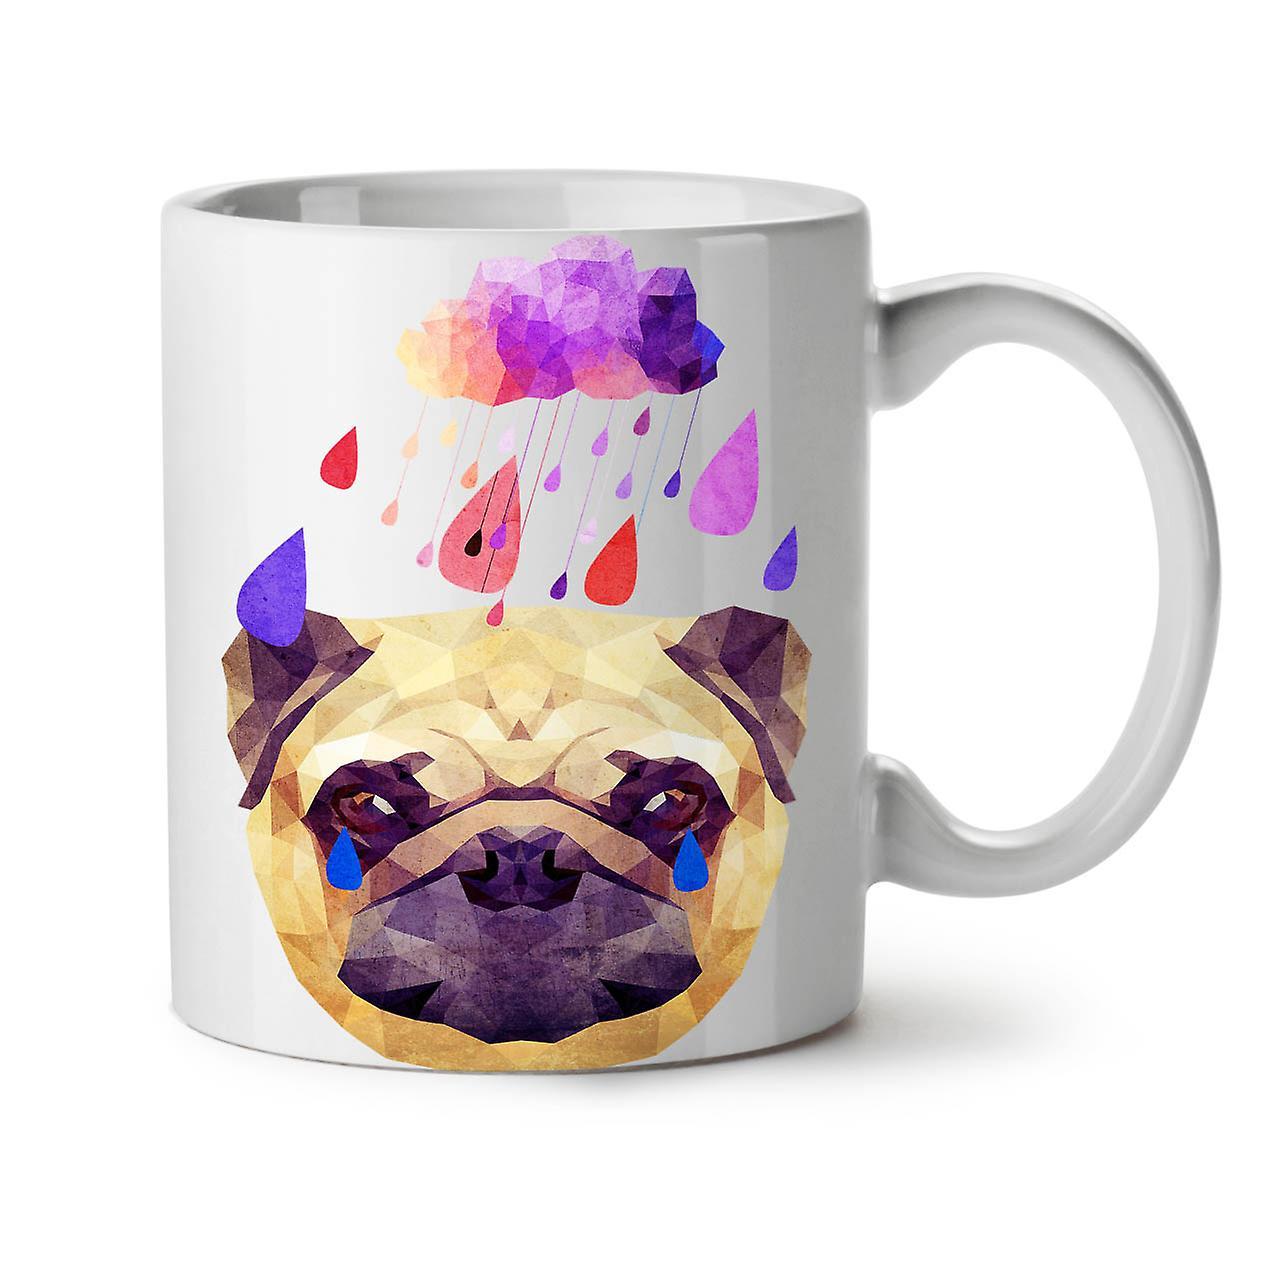 Céramique Dog Café Blanc Pluie 11 Tasse Nouveau OzWellcoda Drôle Thé Pug Cool vnw8Oy0mN